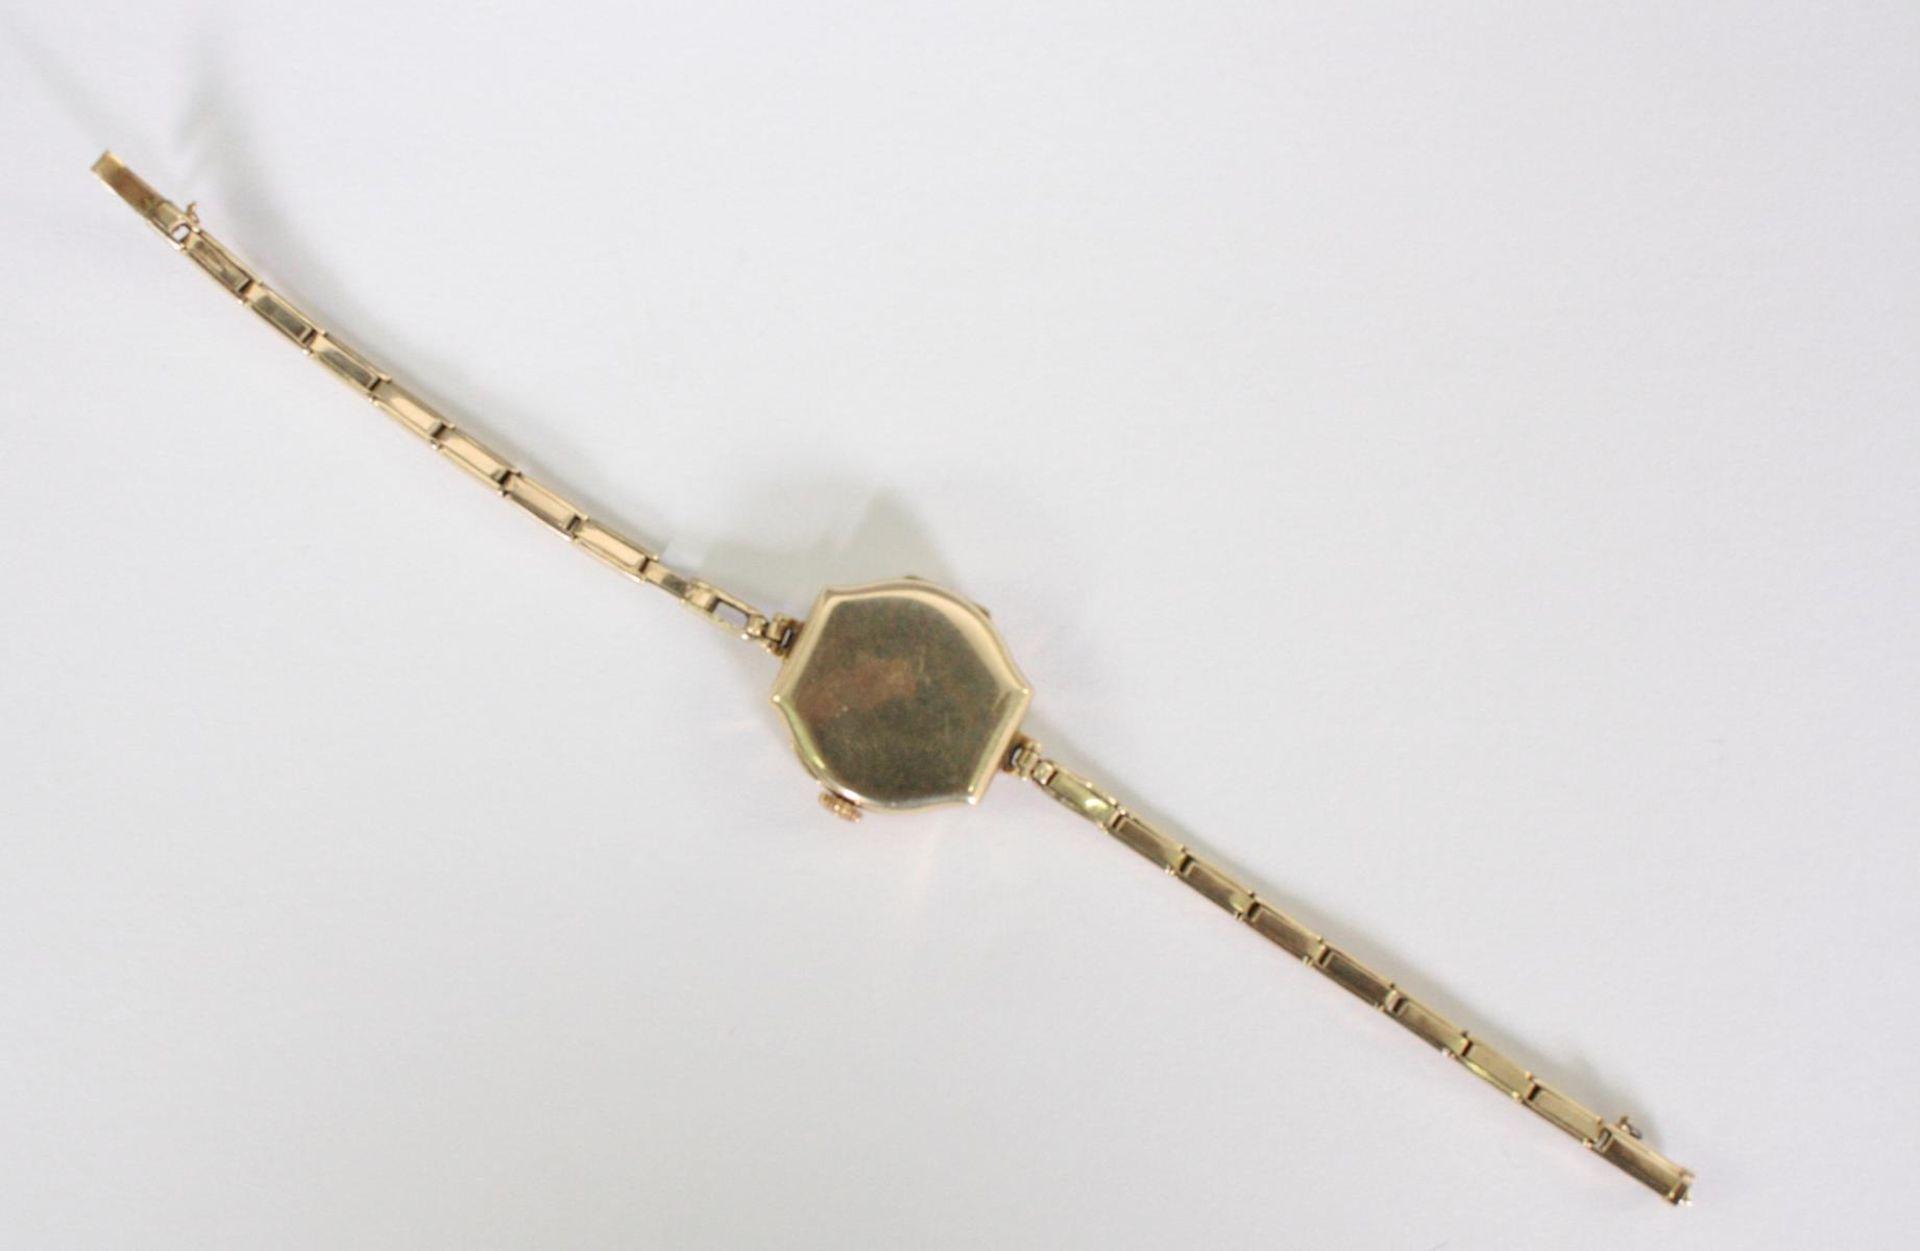 Antike Damenarmbanduhr, 14 Karat Gelbgold - Bild 3 aus 5